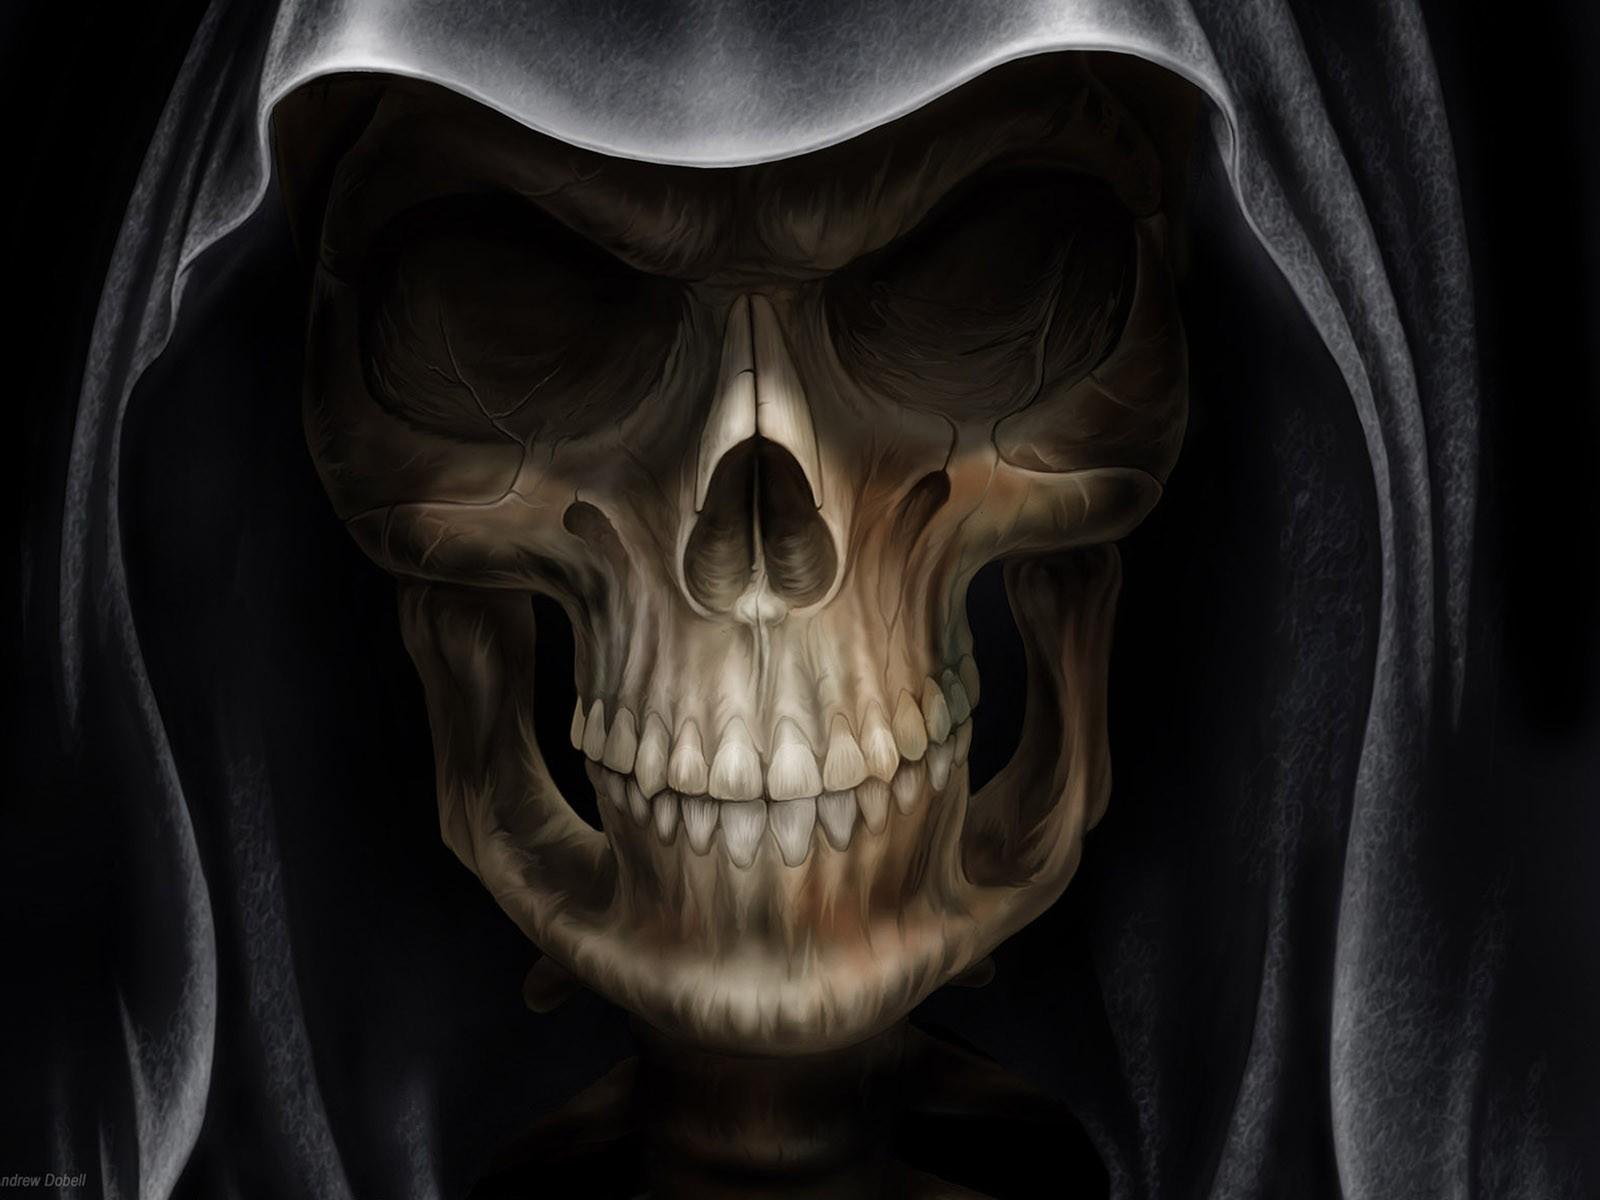 http://1.bp.blogspot.com/_u6-KZ2w5R7o/TQ62db95NNI/AAAAAAAAAW0/ZIJQe5EaM8Q/s1600/morte-sorte.jpg